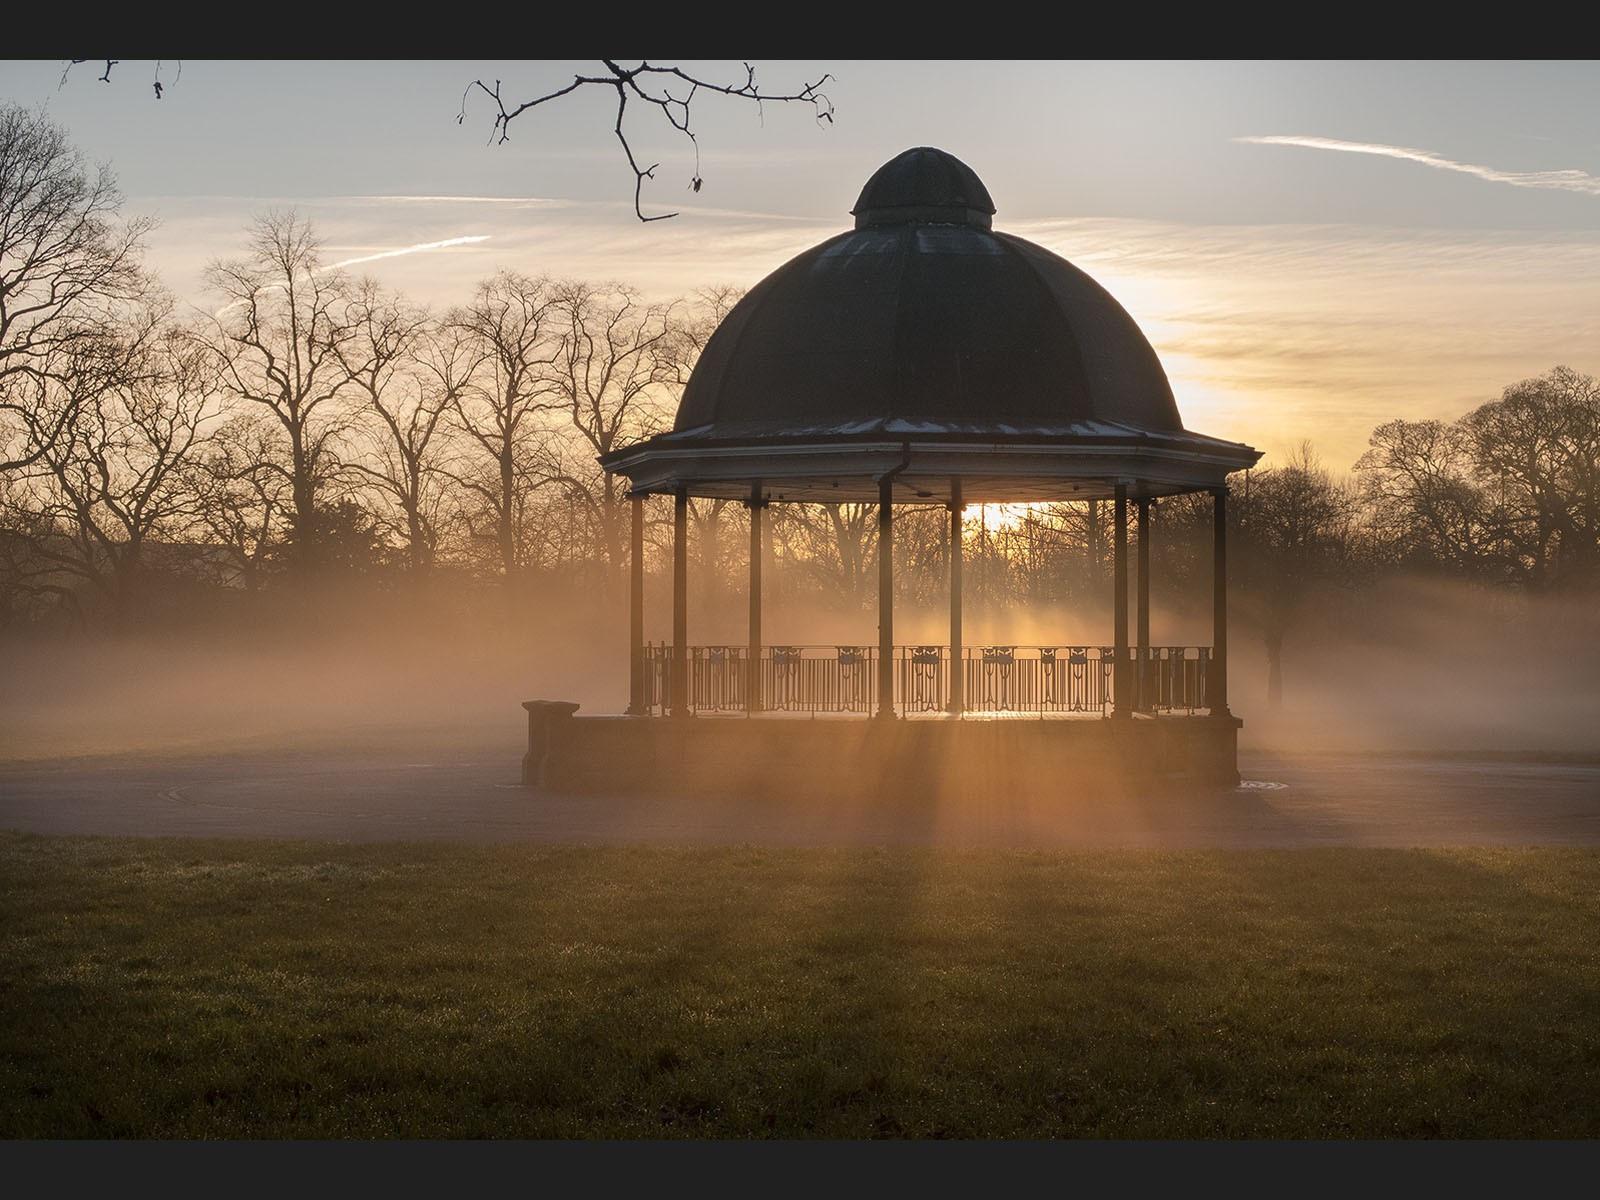 IMG_1604 vict park bandstand sunset